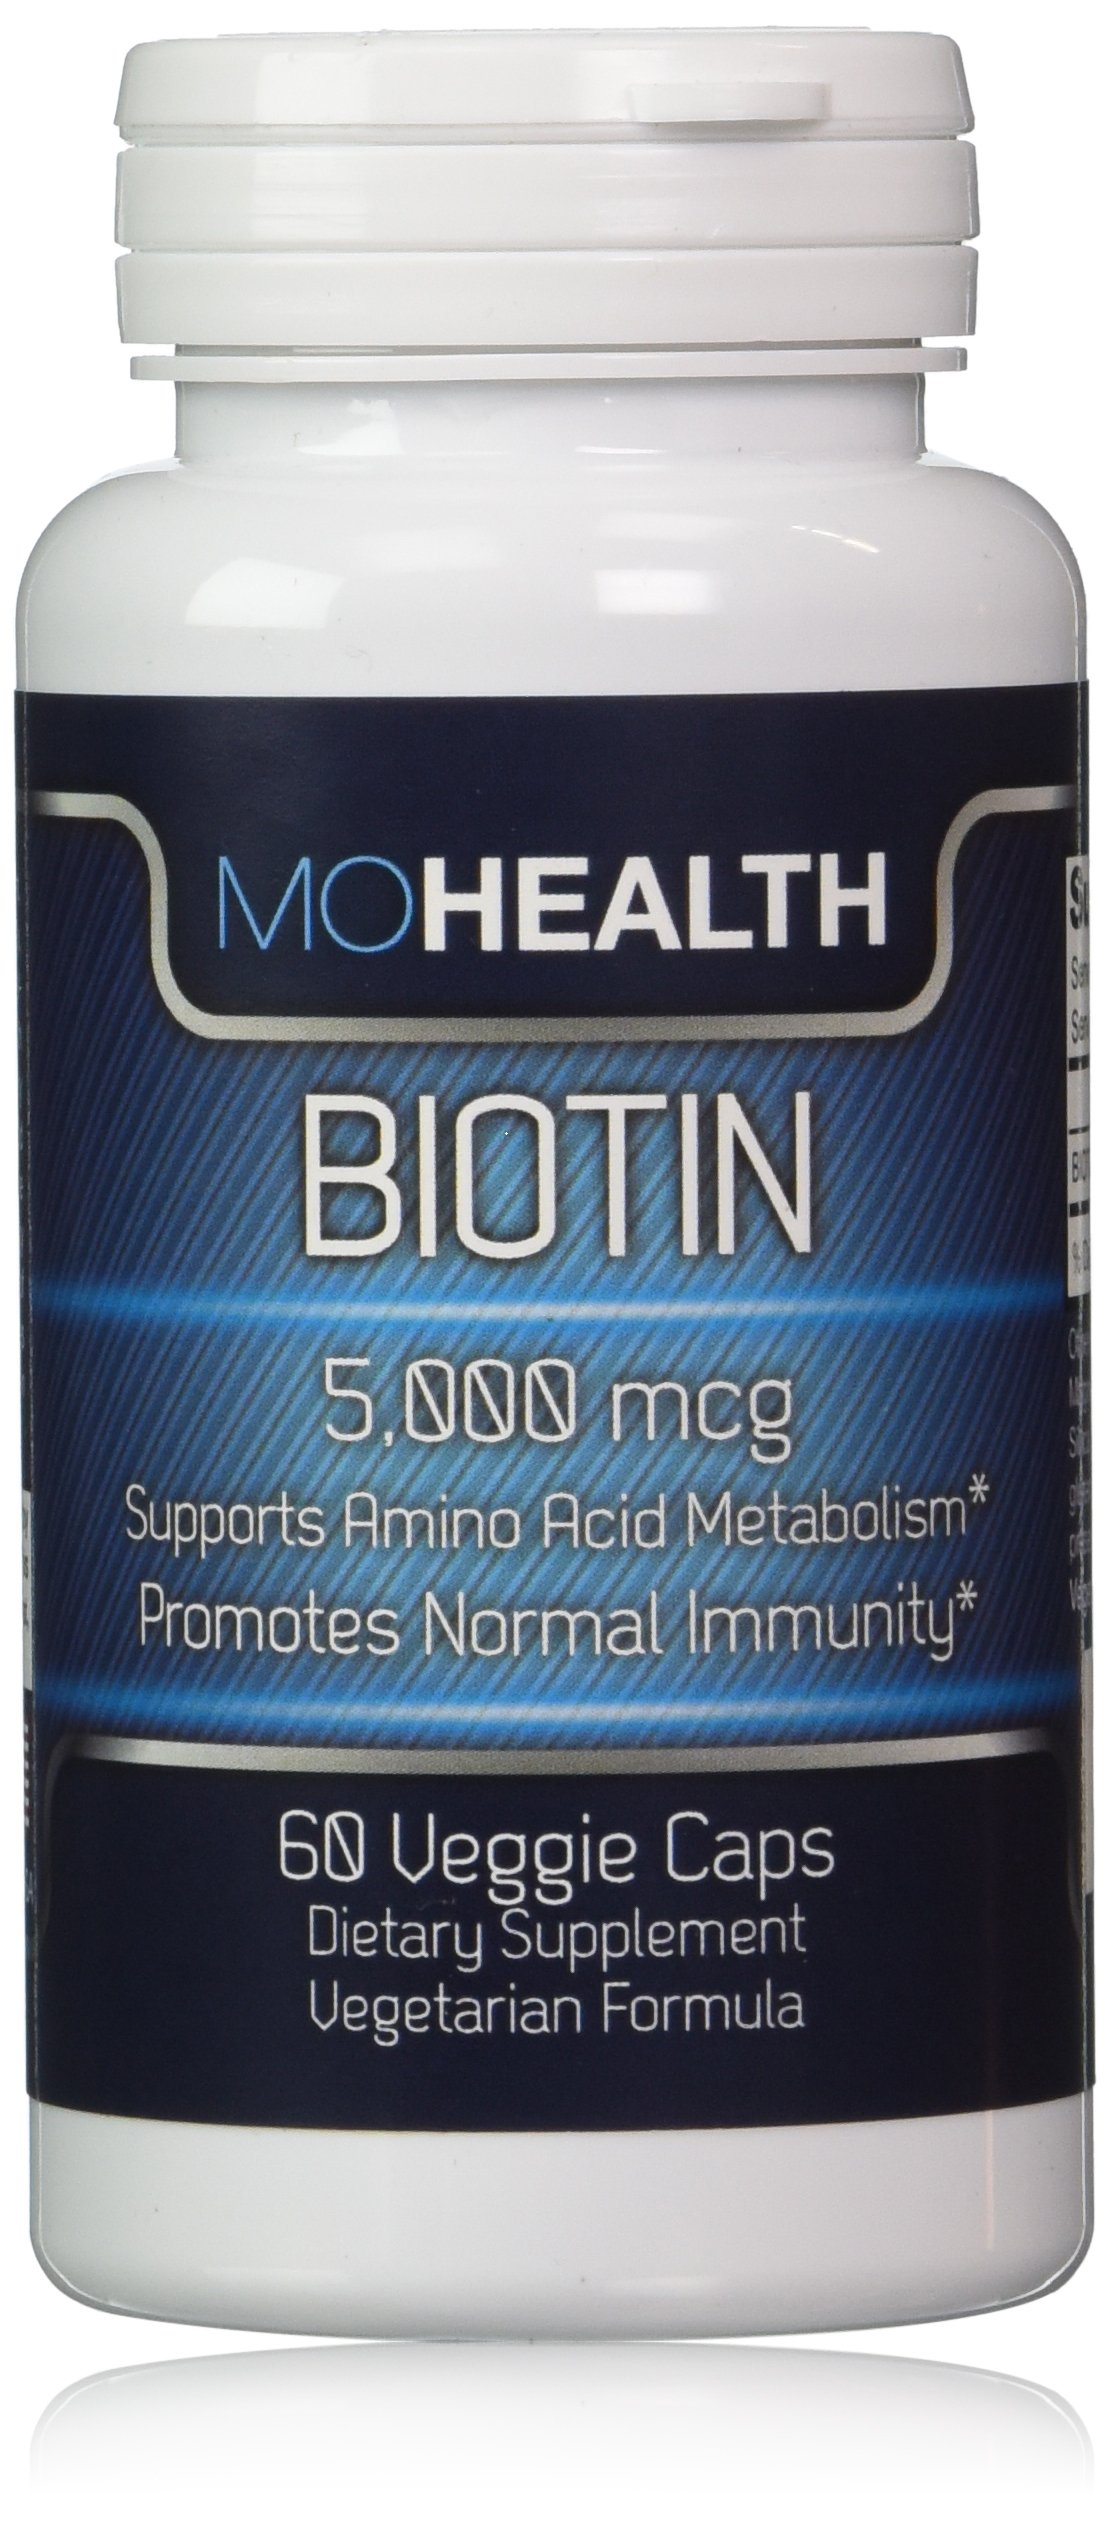 Biotin Veggie Caps ★Benefits Skin, Healthy Hair Growth and Strengthens Nails ★Vegan/Vegetarian Formula, High Potency 5,000 mcg ★ Money Back Guarantee